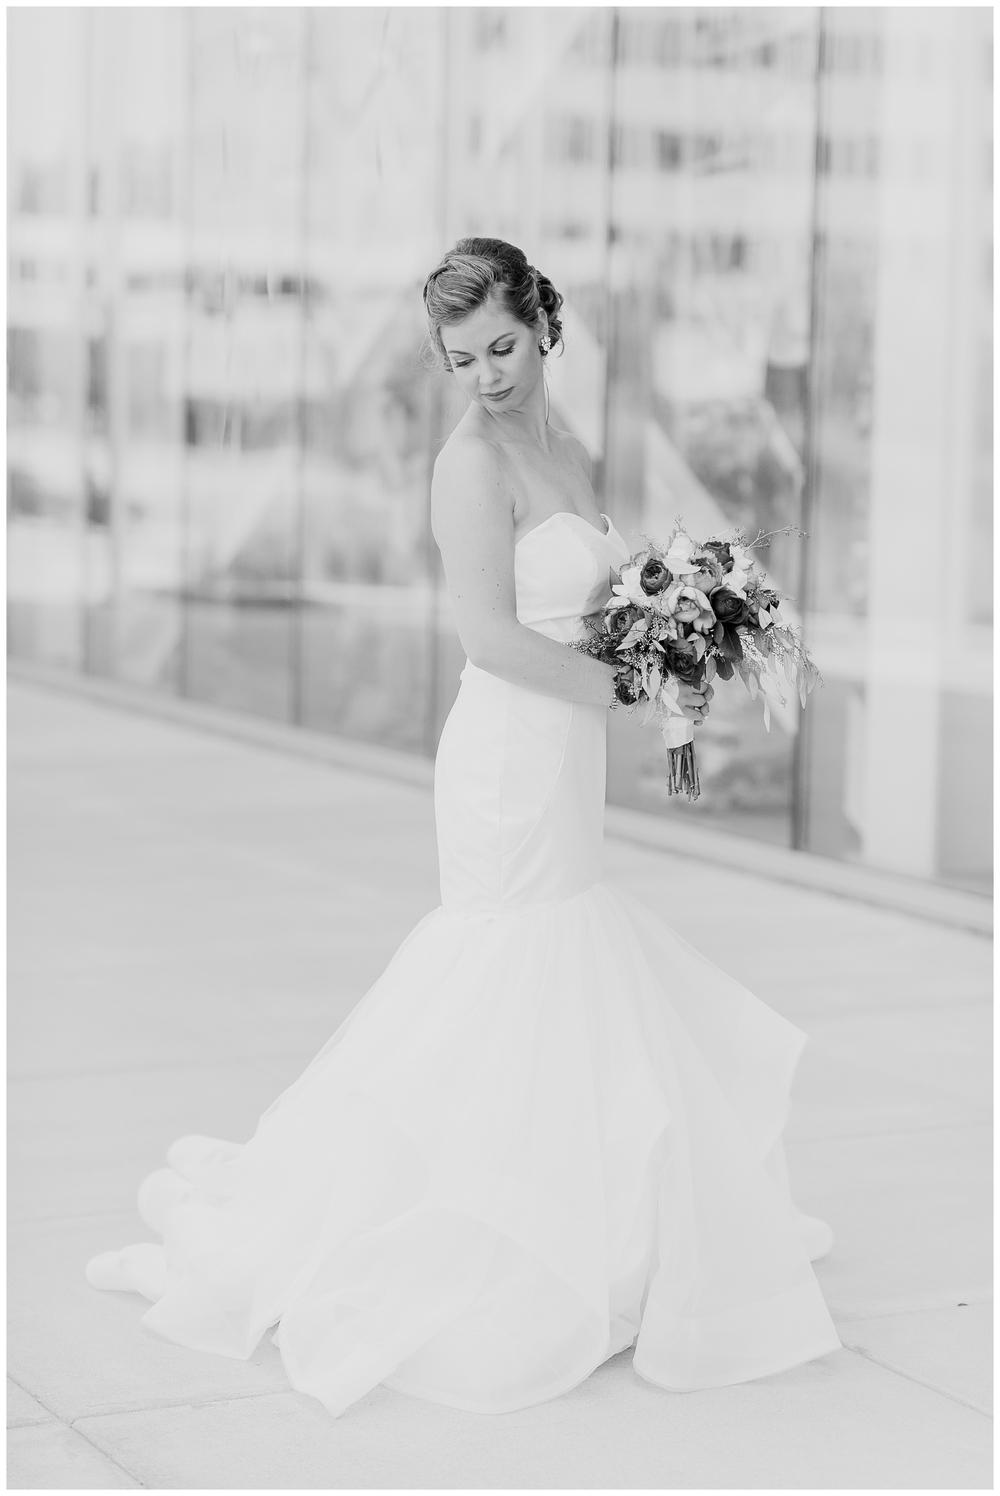 Rebecca_Bridges_Photography_Indianapolis_Wedding_Photographer_5027.jpg